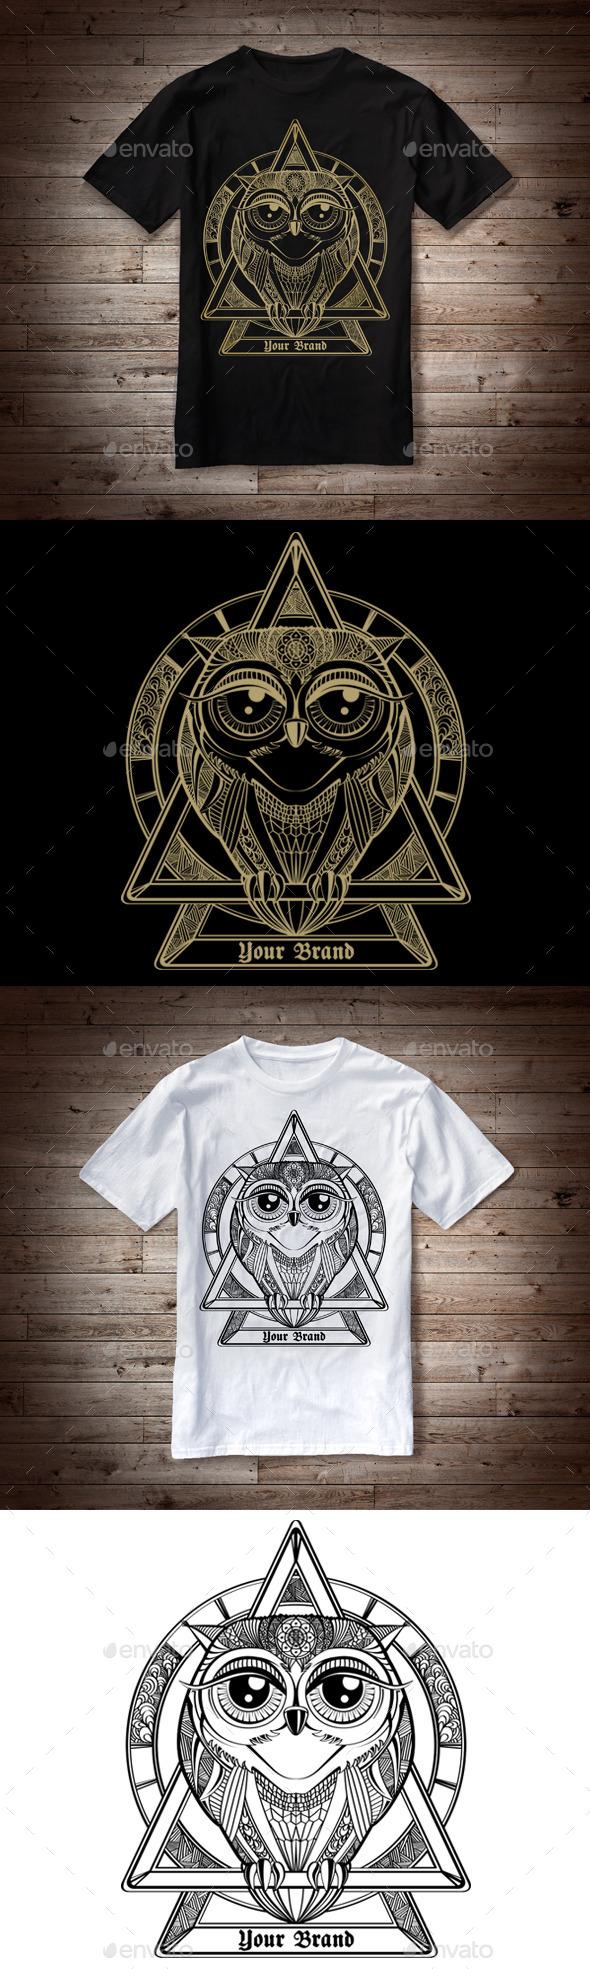 T-Shirt Illustration Owl Theme - Designs T-Shirts